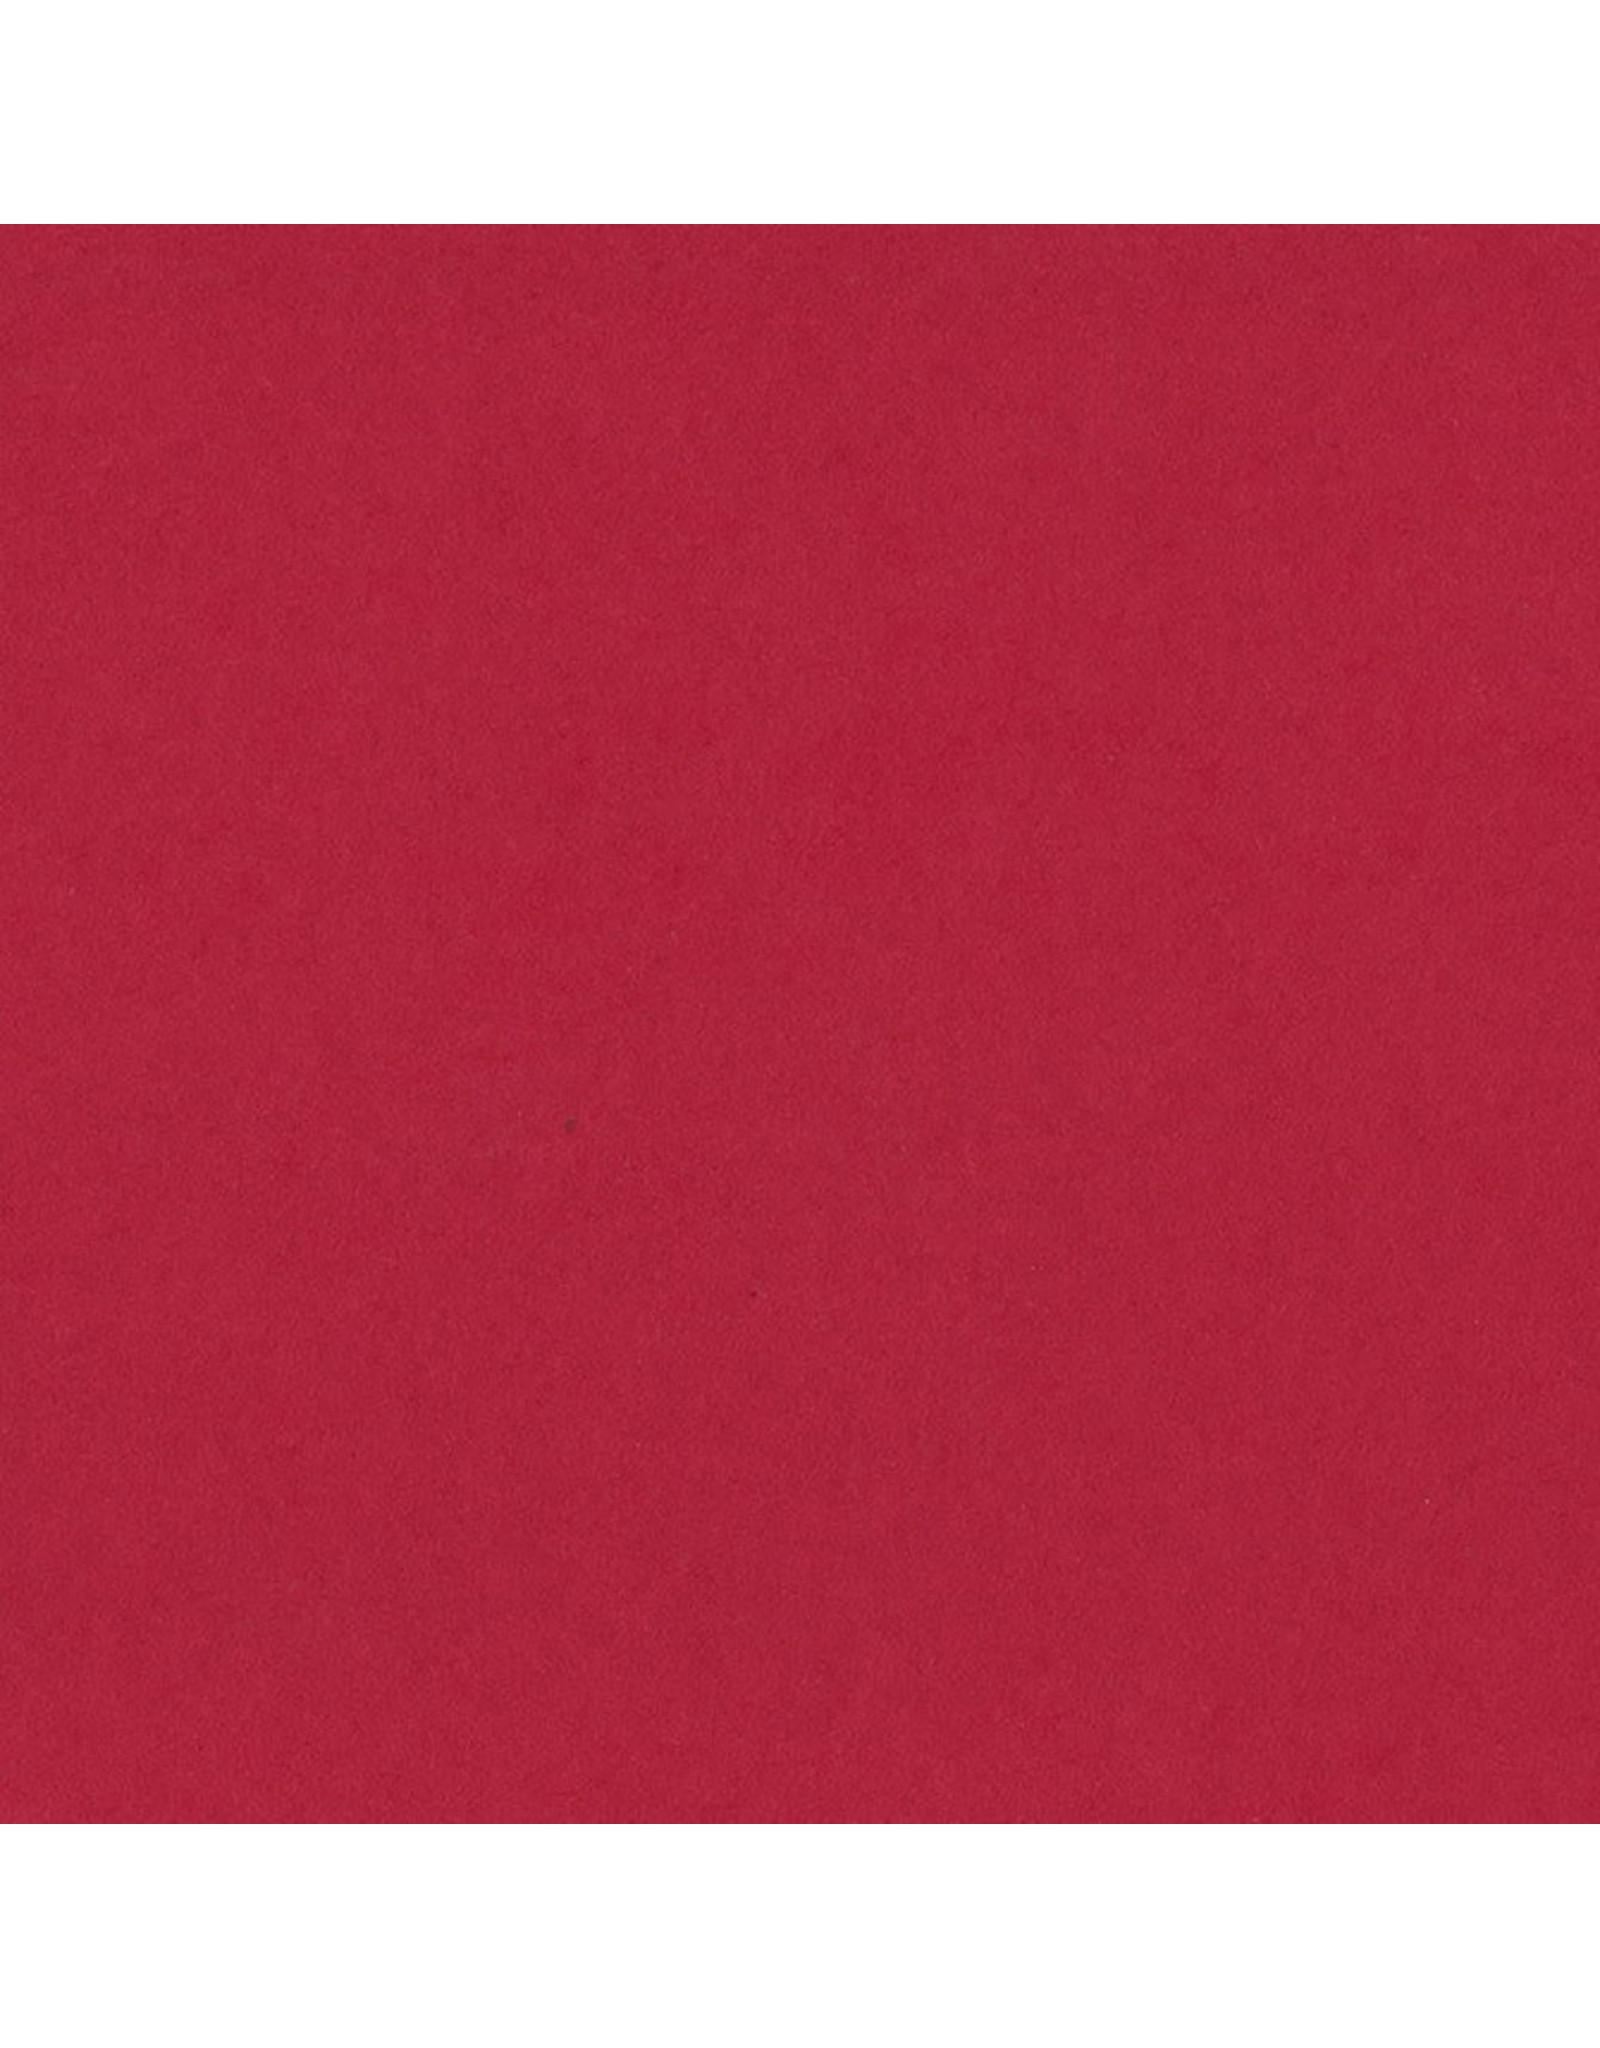 Bazzill Bazzill Card Shoppe 8.5x11 -  Lollypop